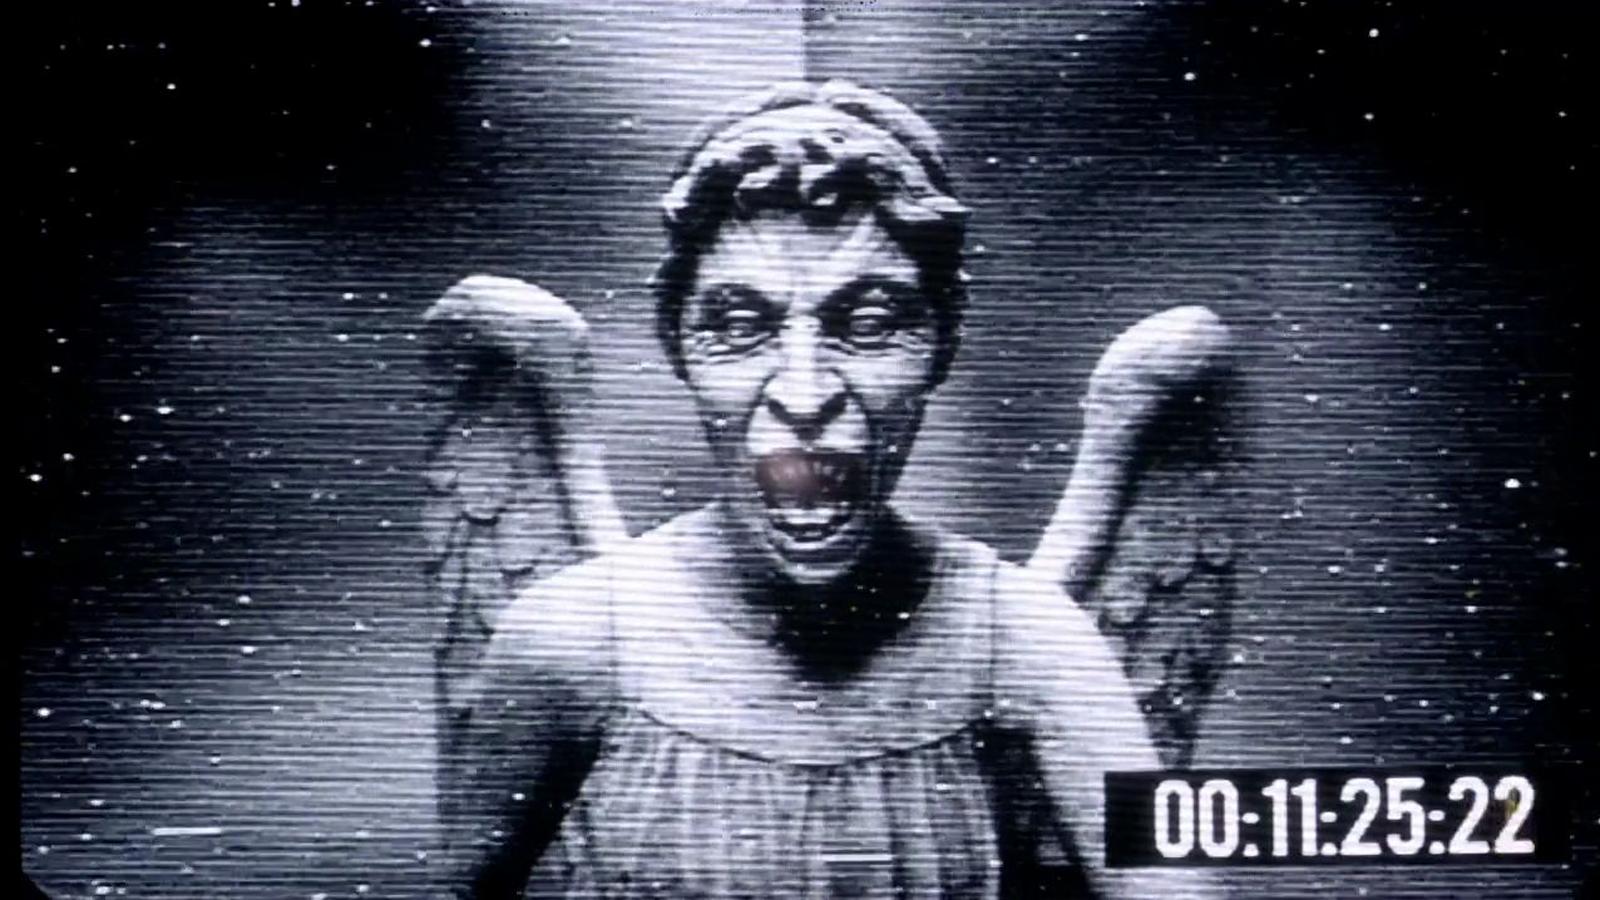 Best 53 Weeping Angels Wallpaper on HipWallpaper Weeping Angels 1600x900